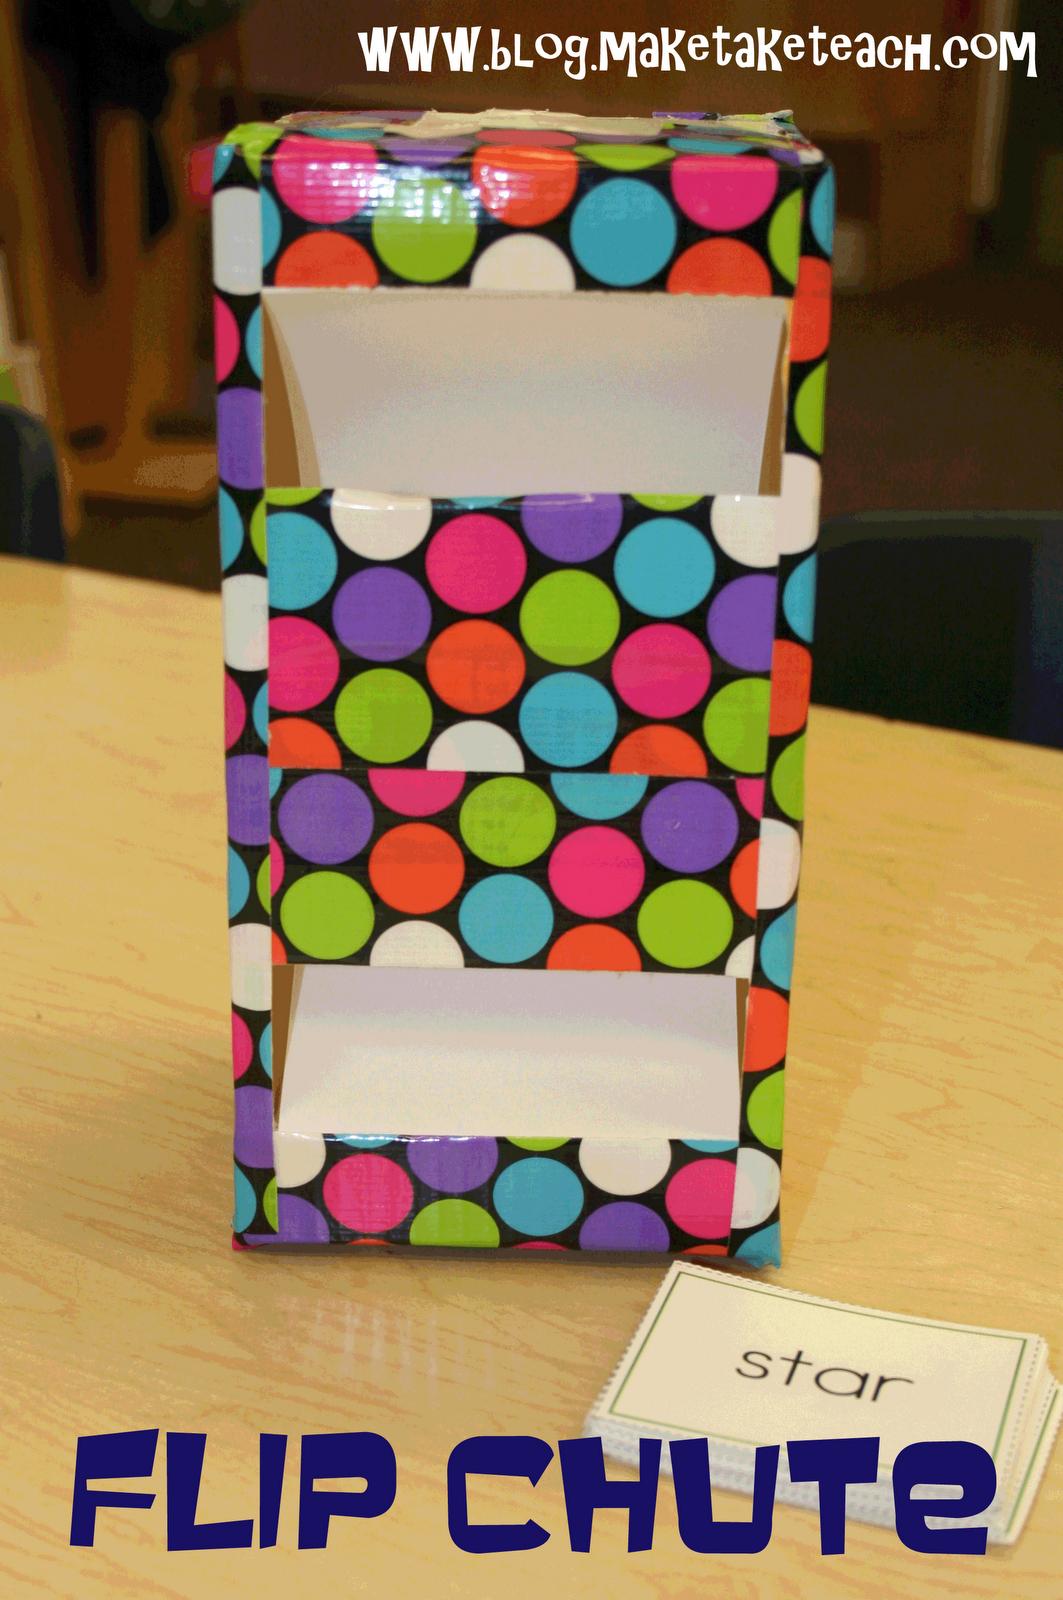 Classroom DIY: DIY Flip Chute  http://www.classroomdiy.com/2012/06/diy-flip-chute.html#